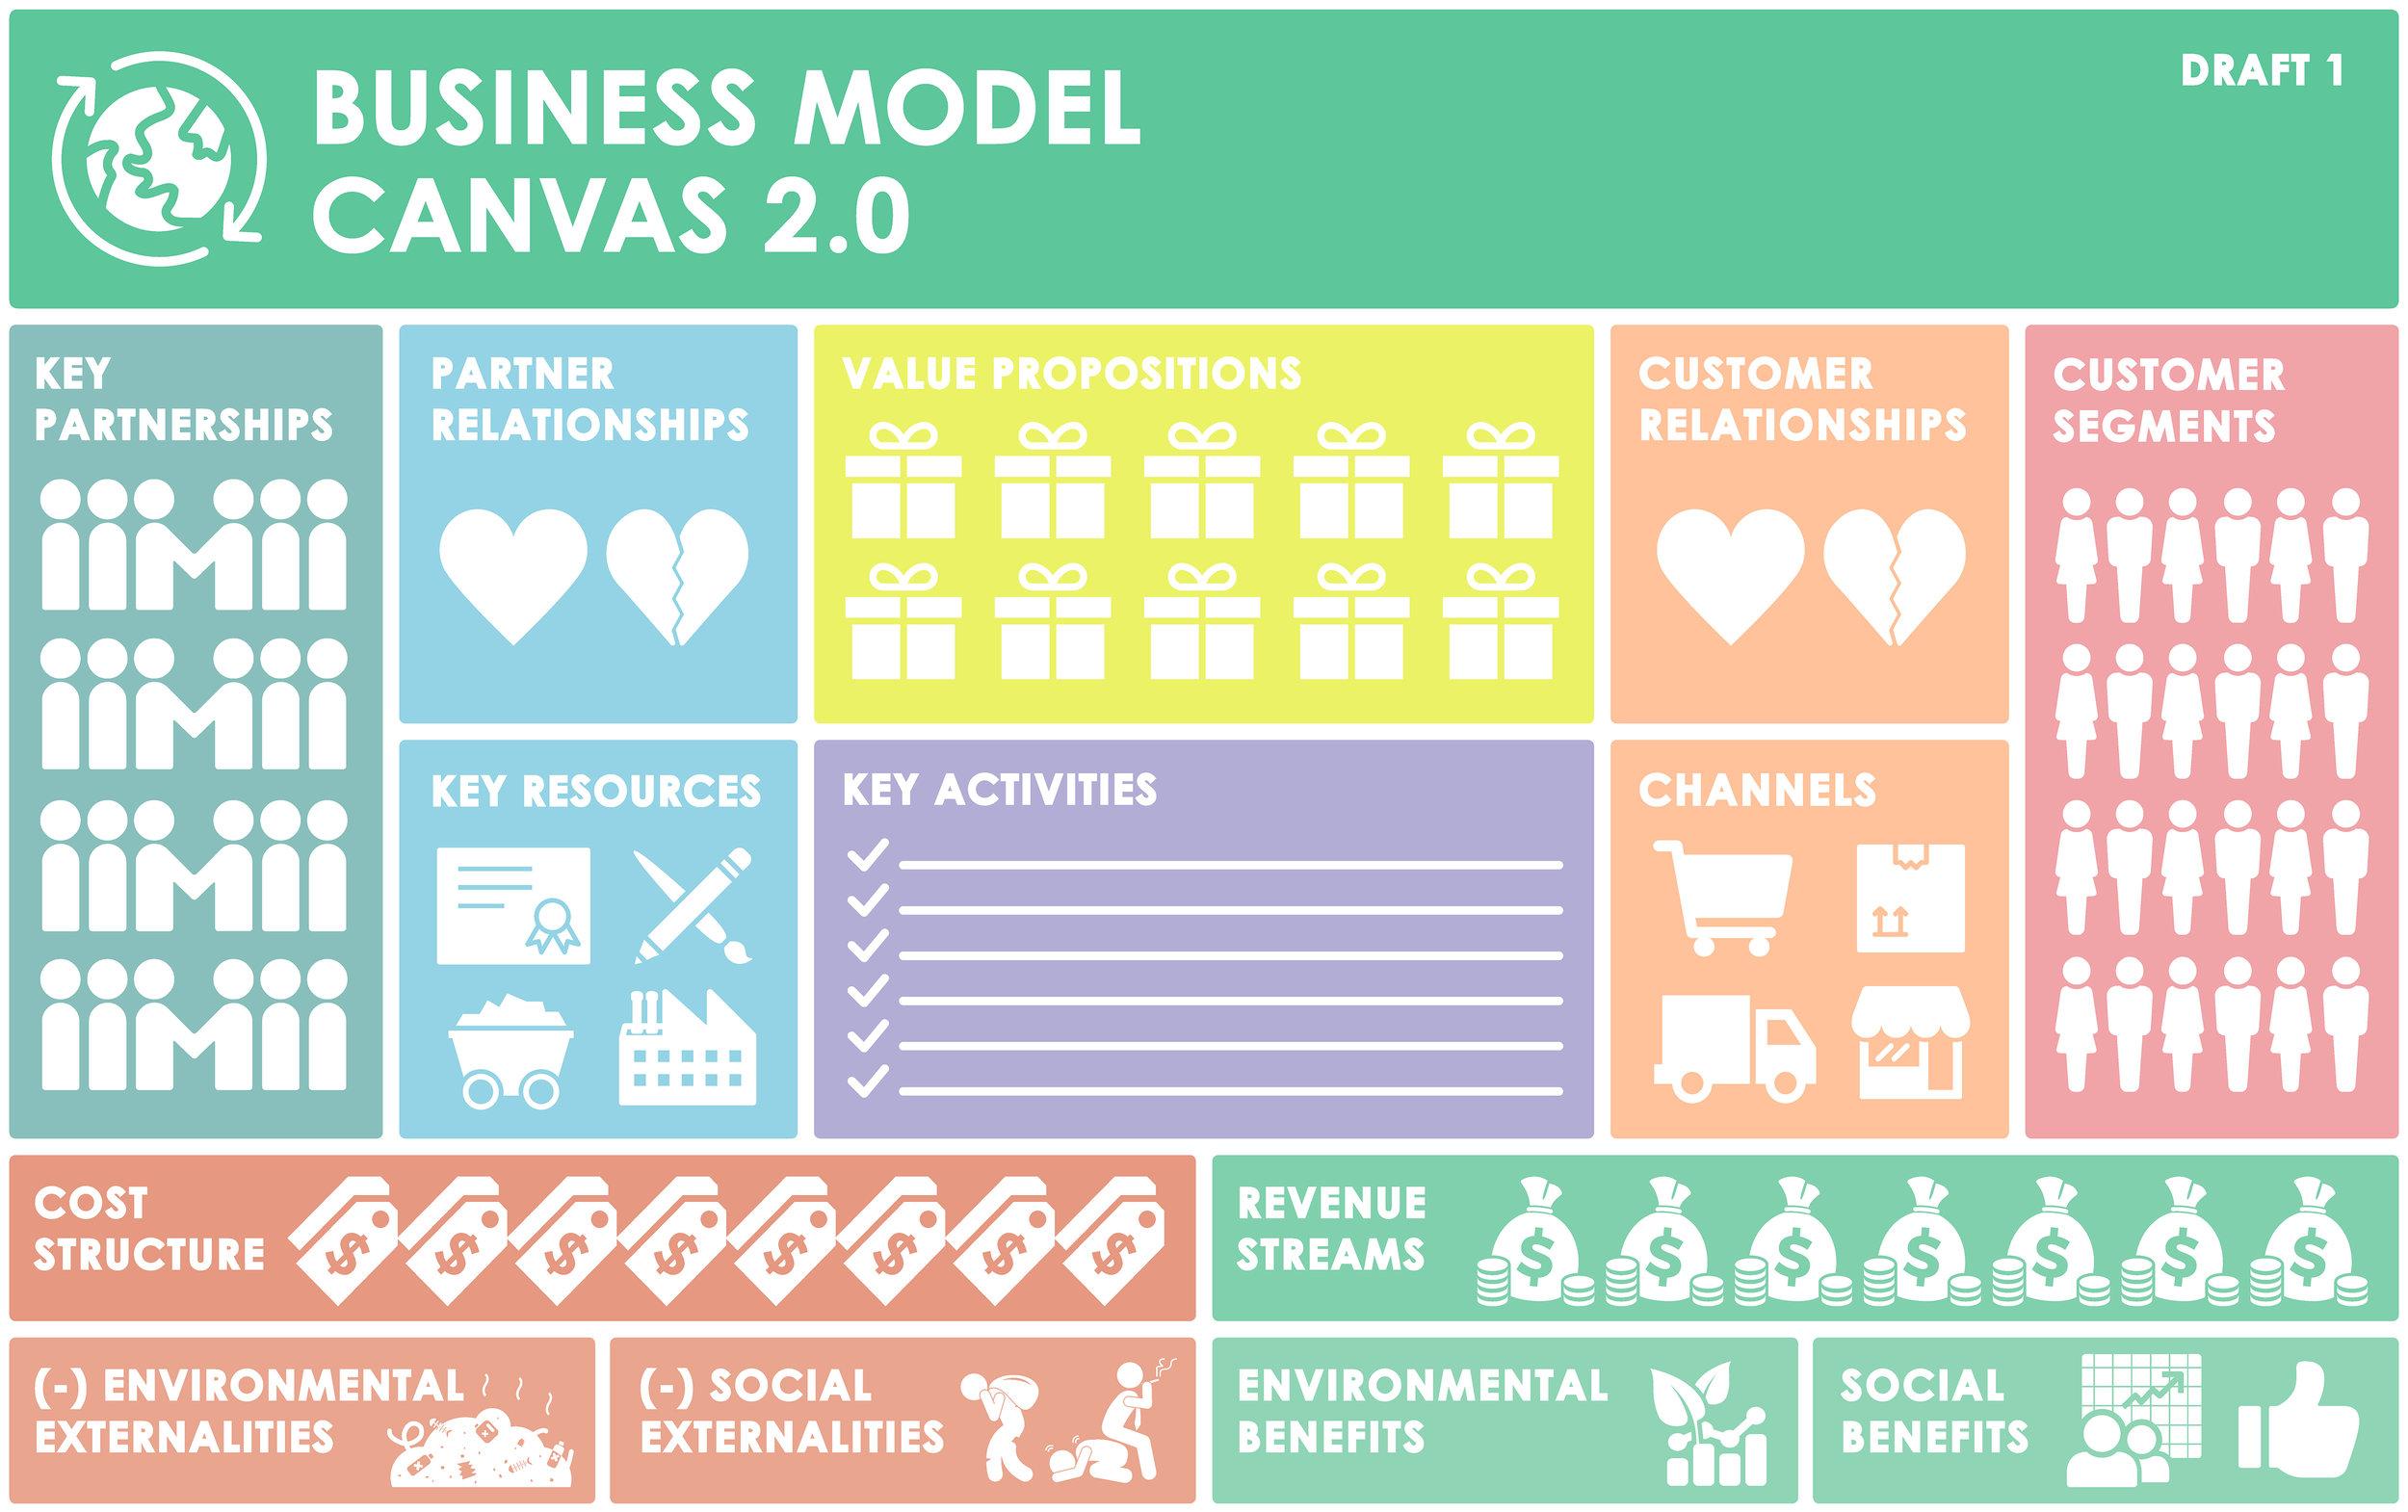 BUSINESS MODEL CANVAS 2.0.jpg